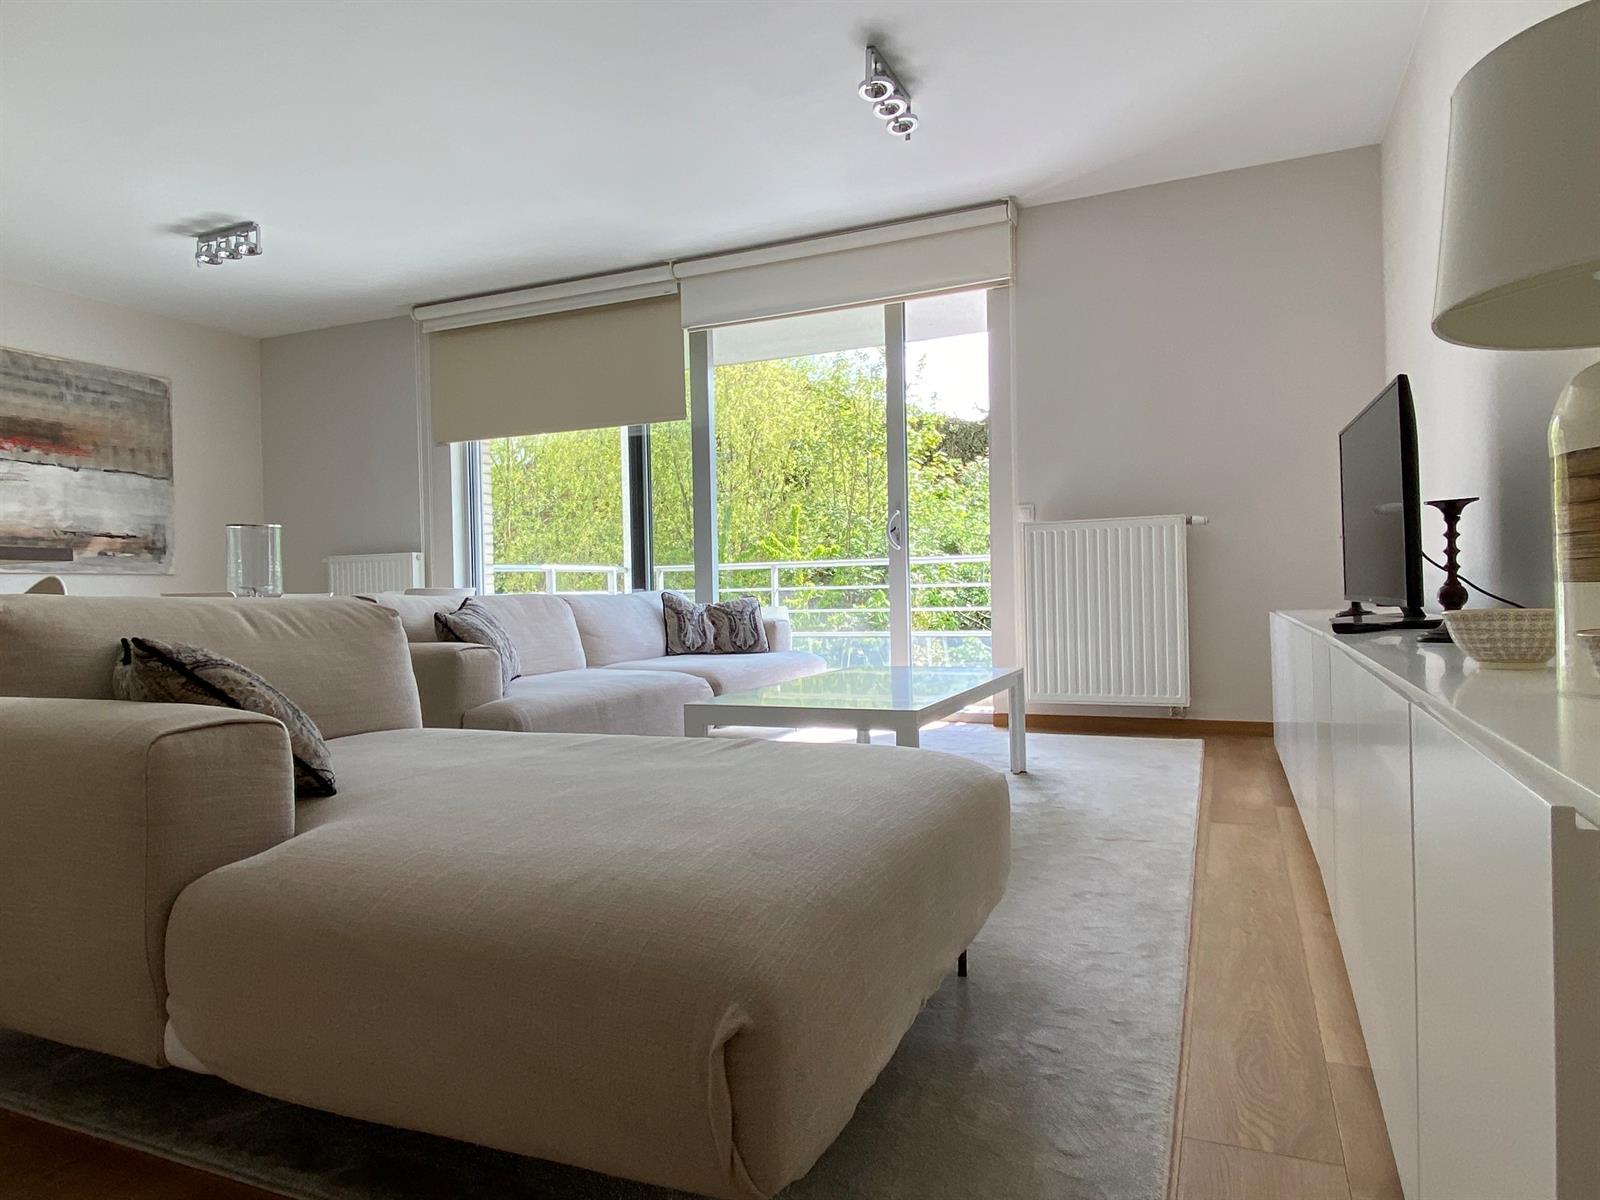 Flat - Etterbeek - #4389571-4